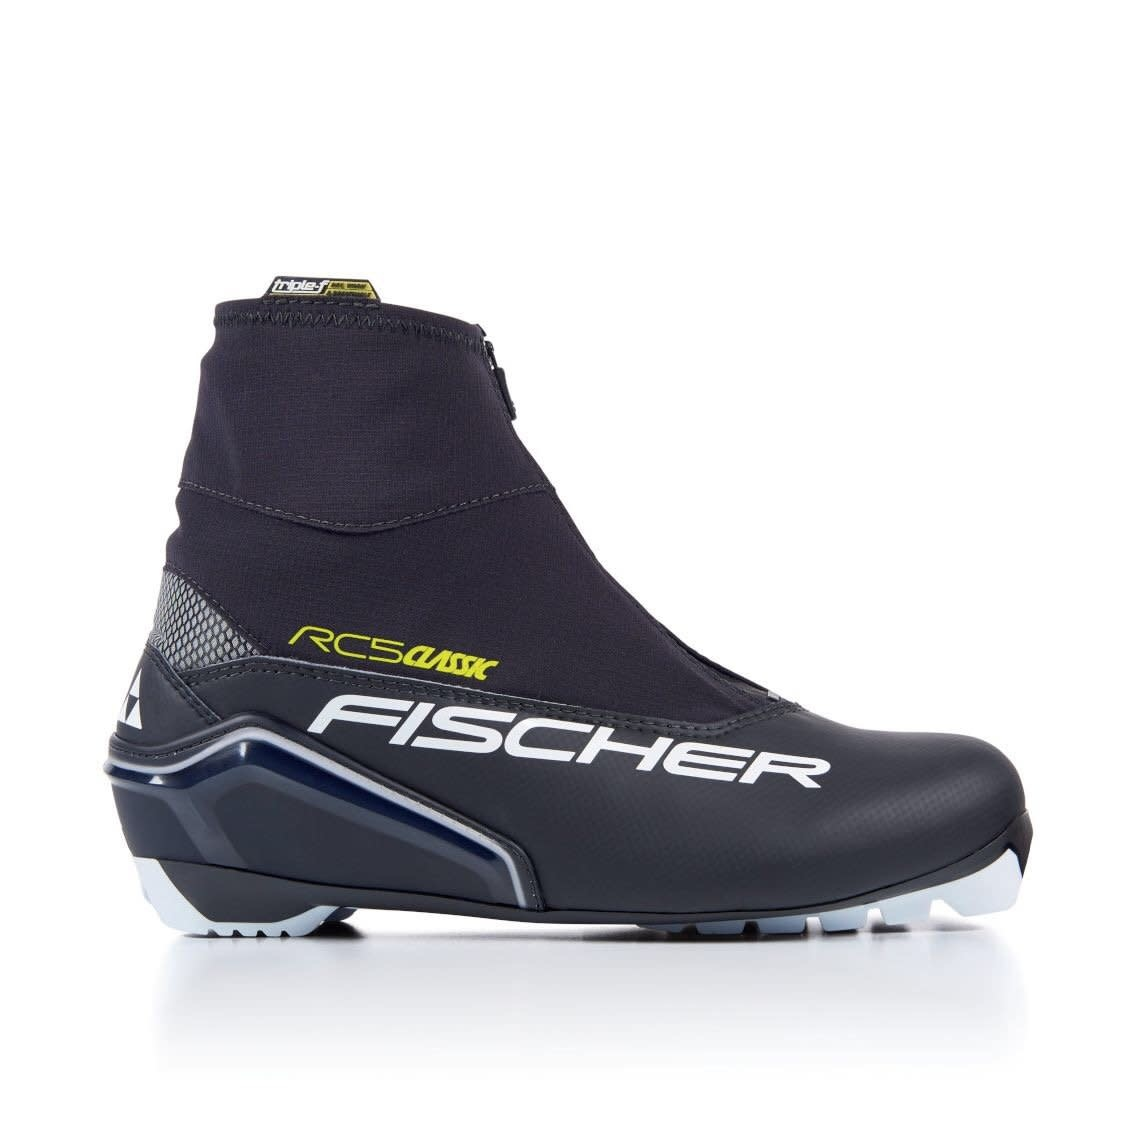 Fischer RC5 Classic Boots